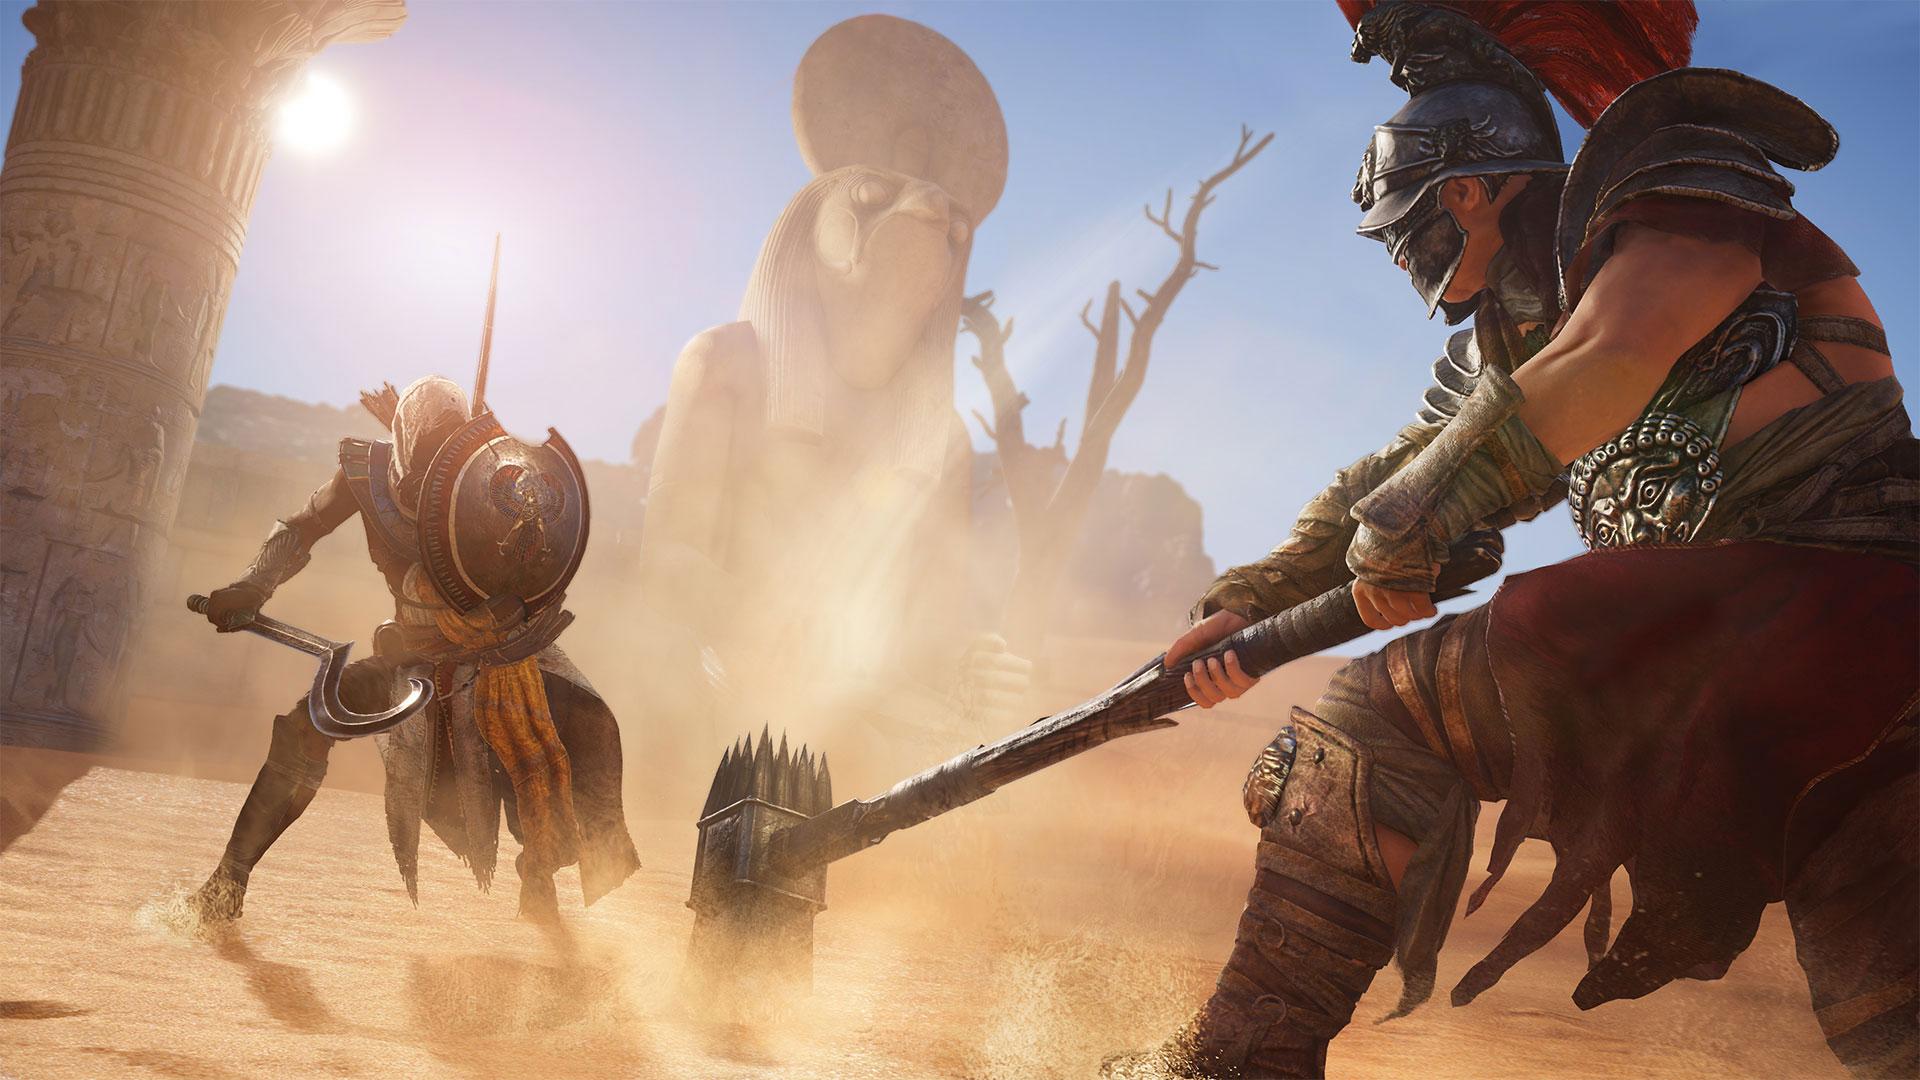 mira-estos-19-minutos-jugabilidad-assassins-creed-origins-xbox-one-x-frikigamers.com